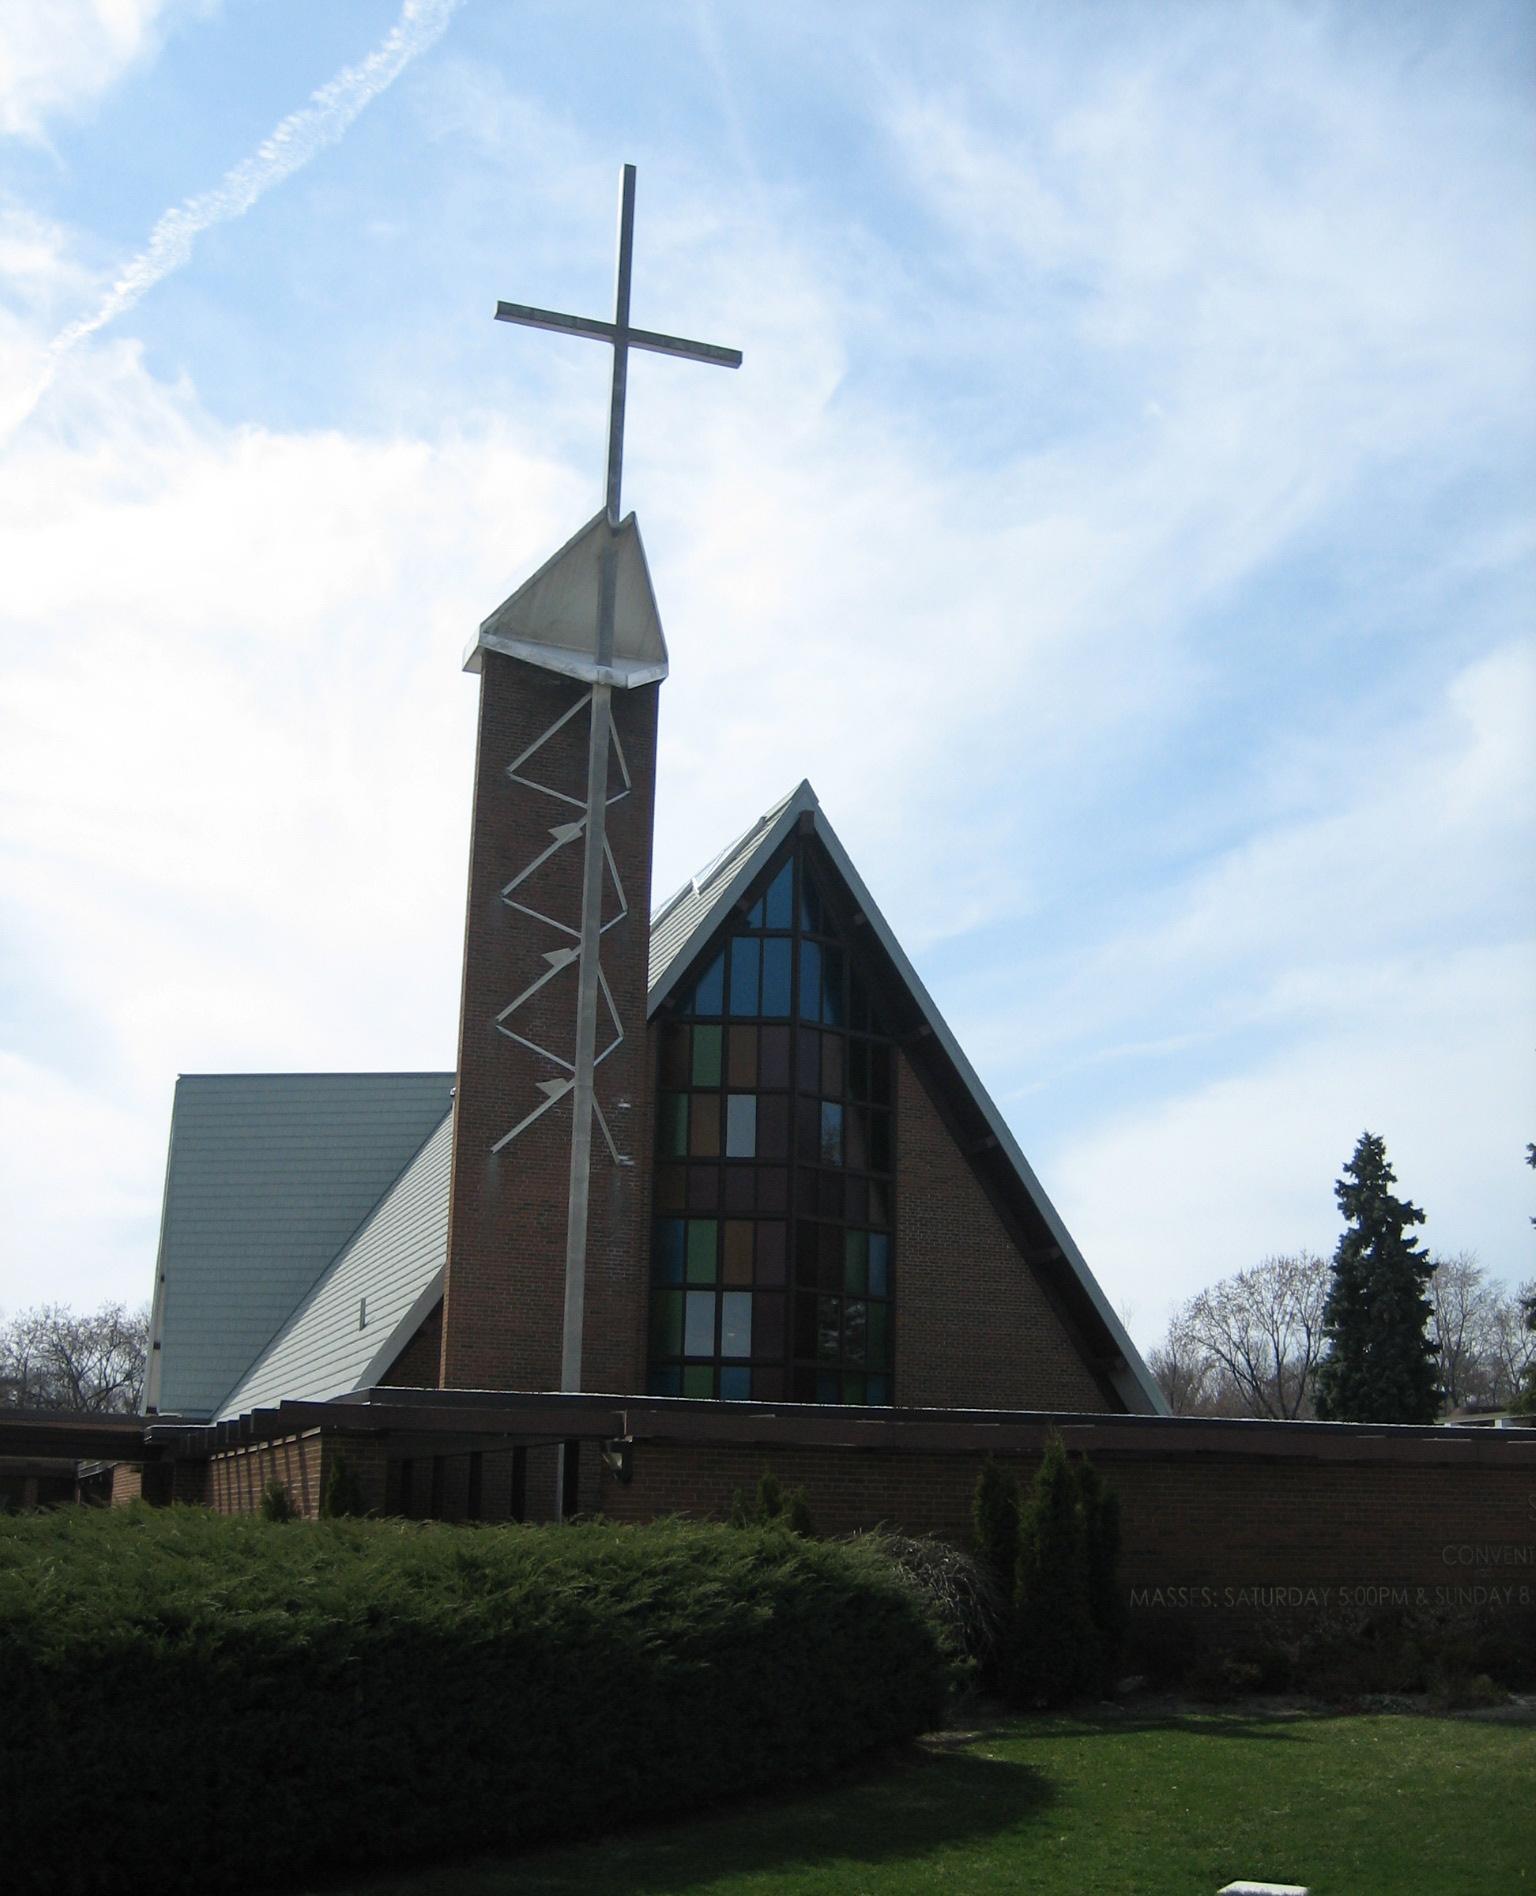 File:St Bonaventure, Toronto.JPG - Wikimedia Commons